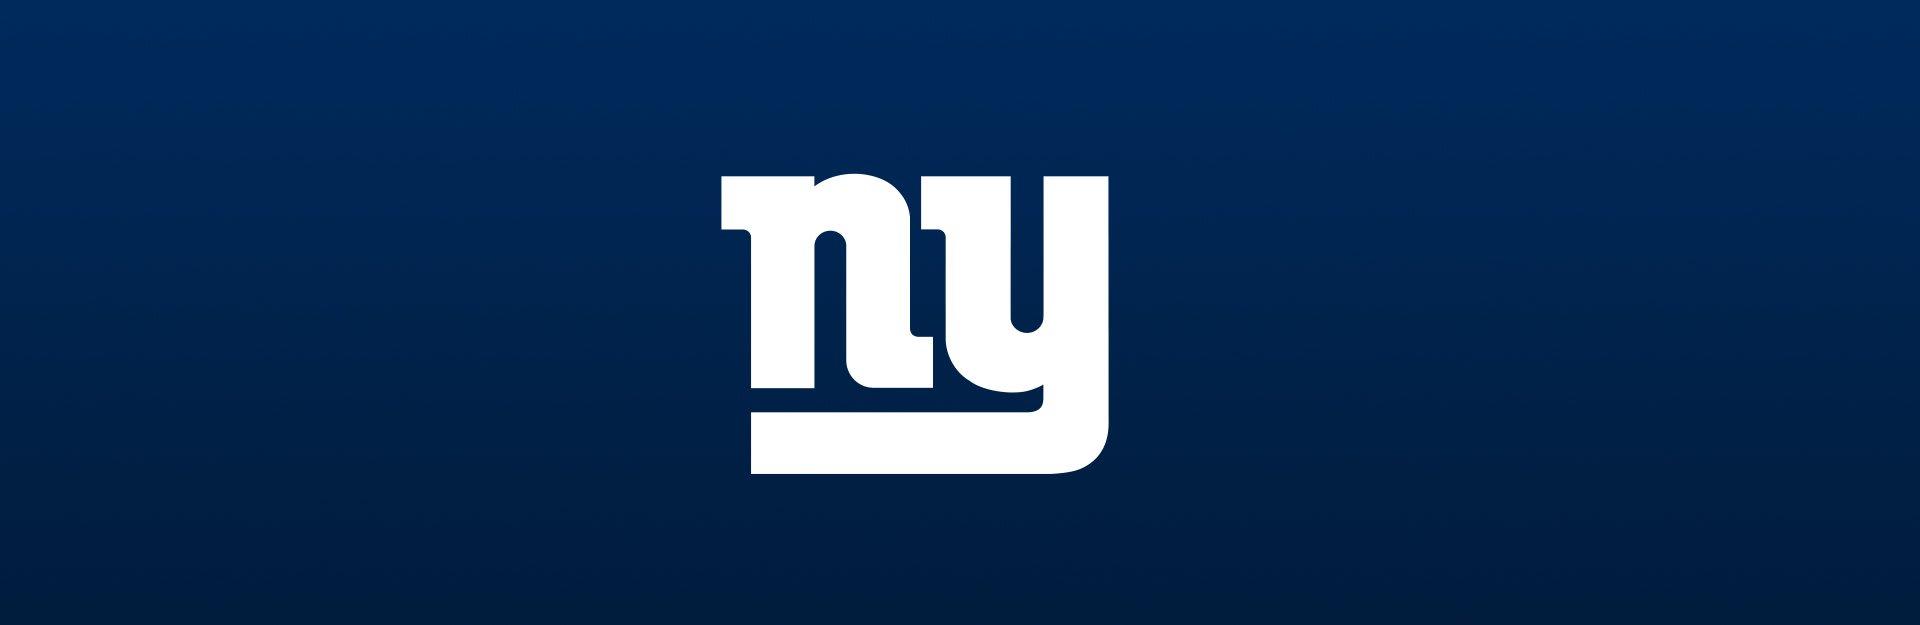 New York Giants logo overlaid on blue background